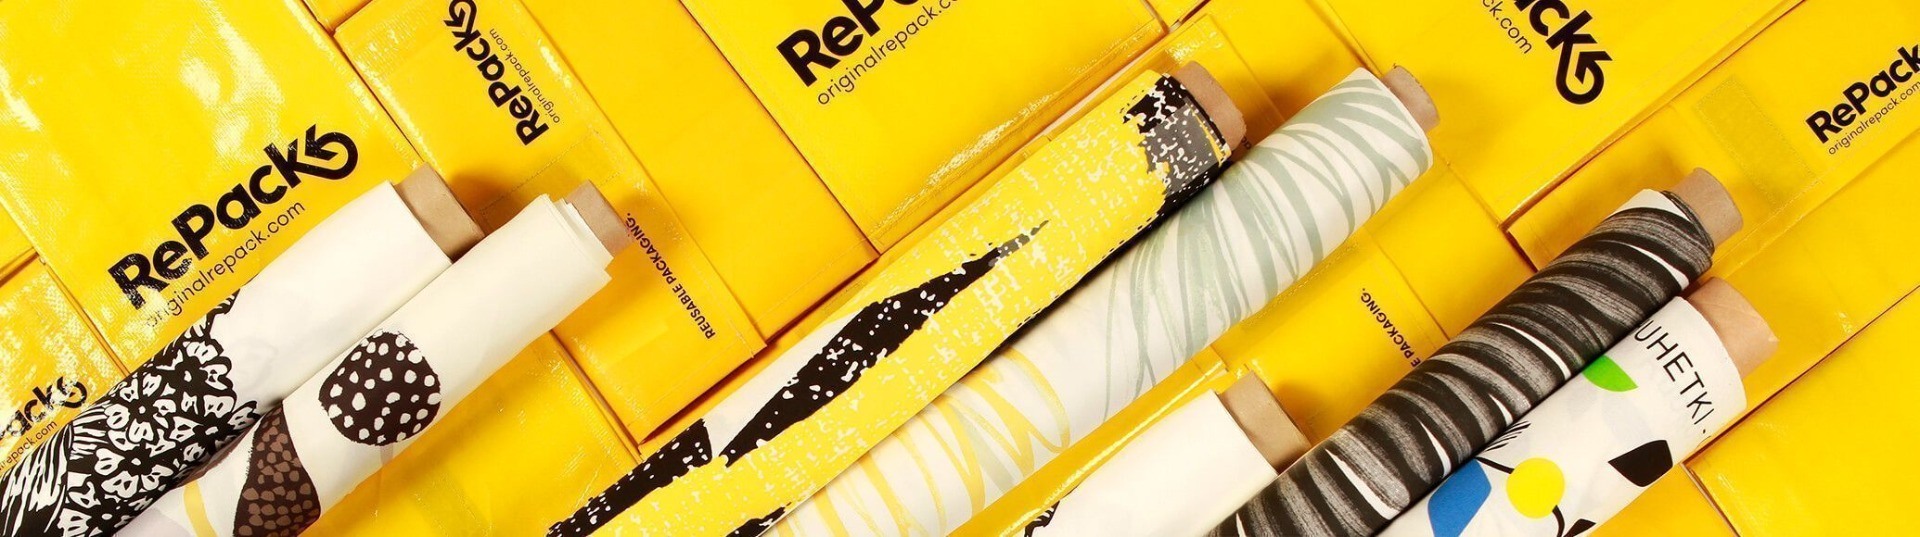 RePack-pakkaus